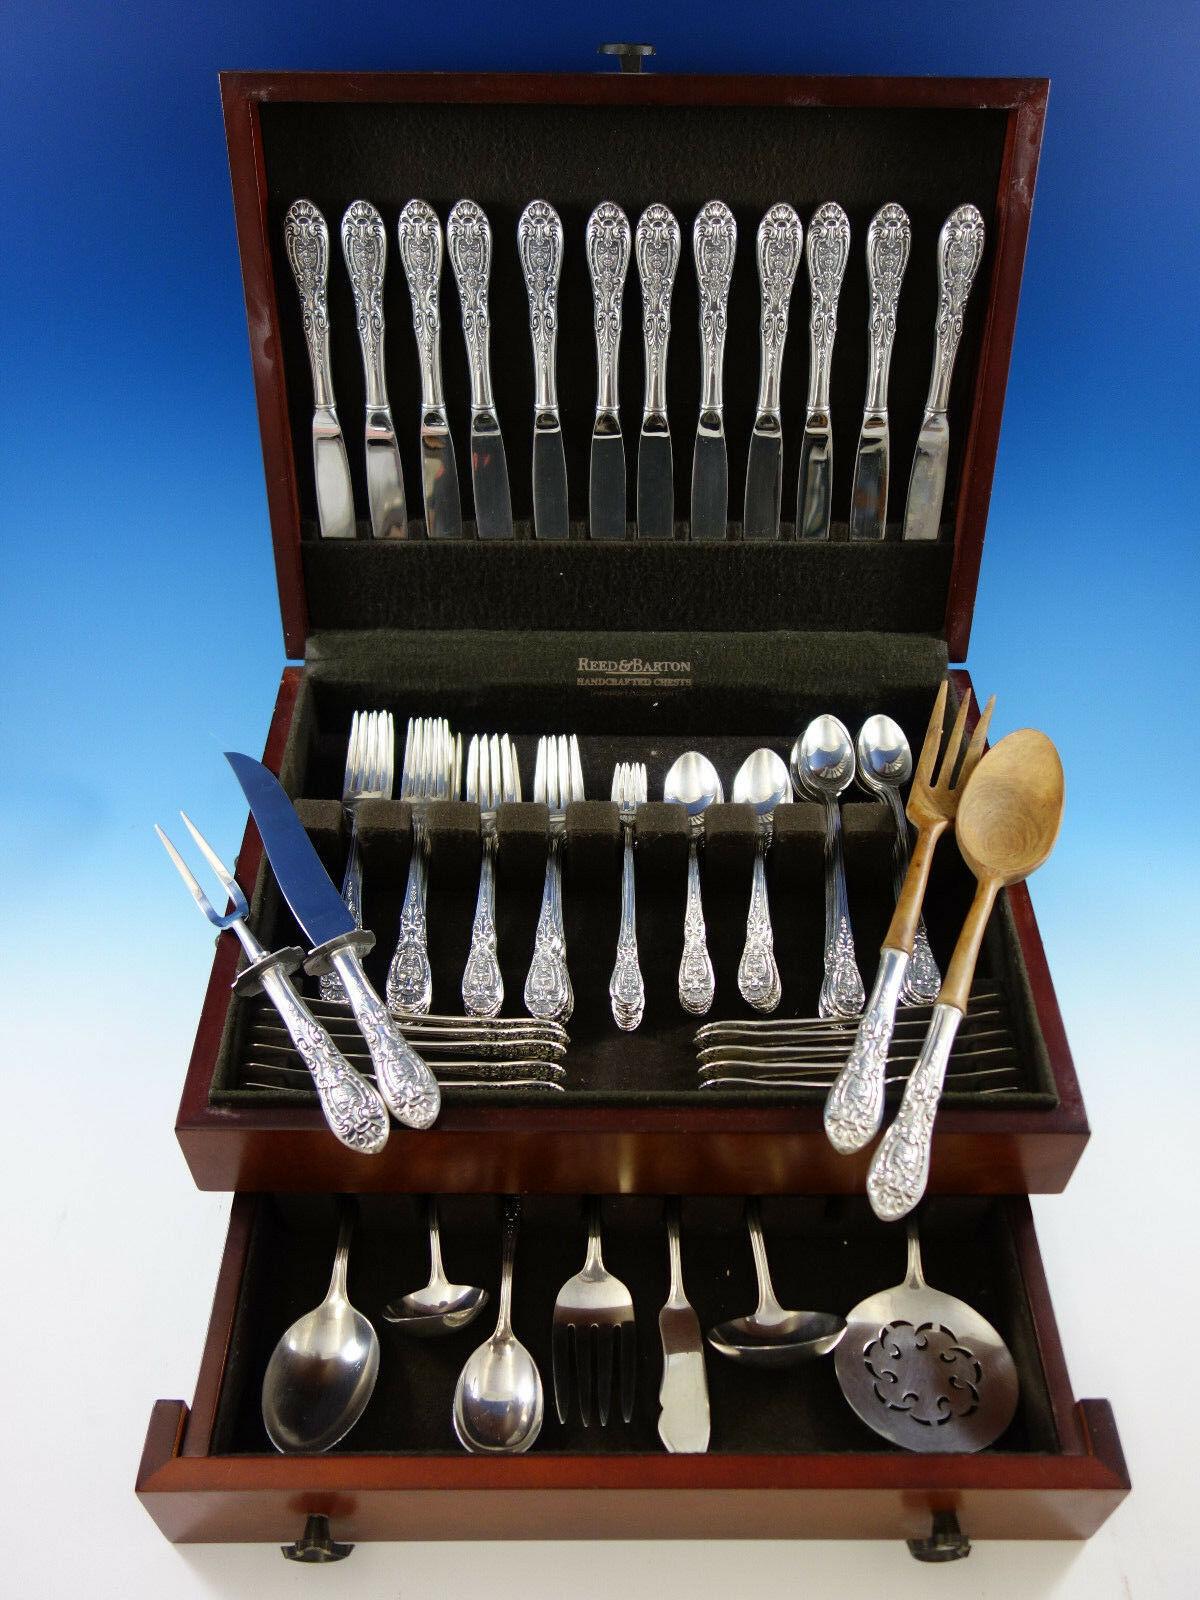 Southern Grandeur By Easterling Sterling Silver Flatware 12 Set Service 95 pcs - $5,695.00